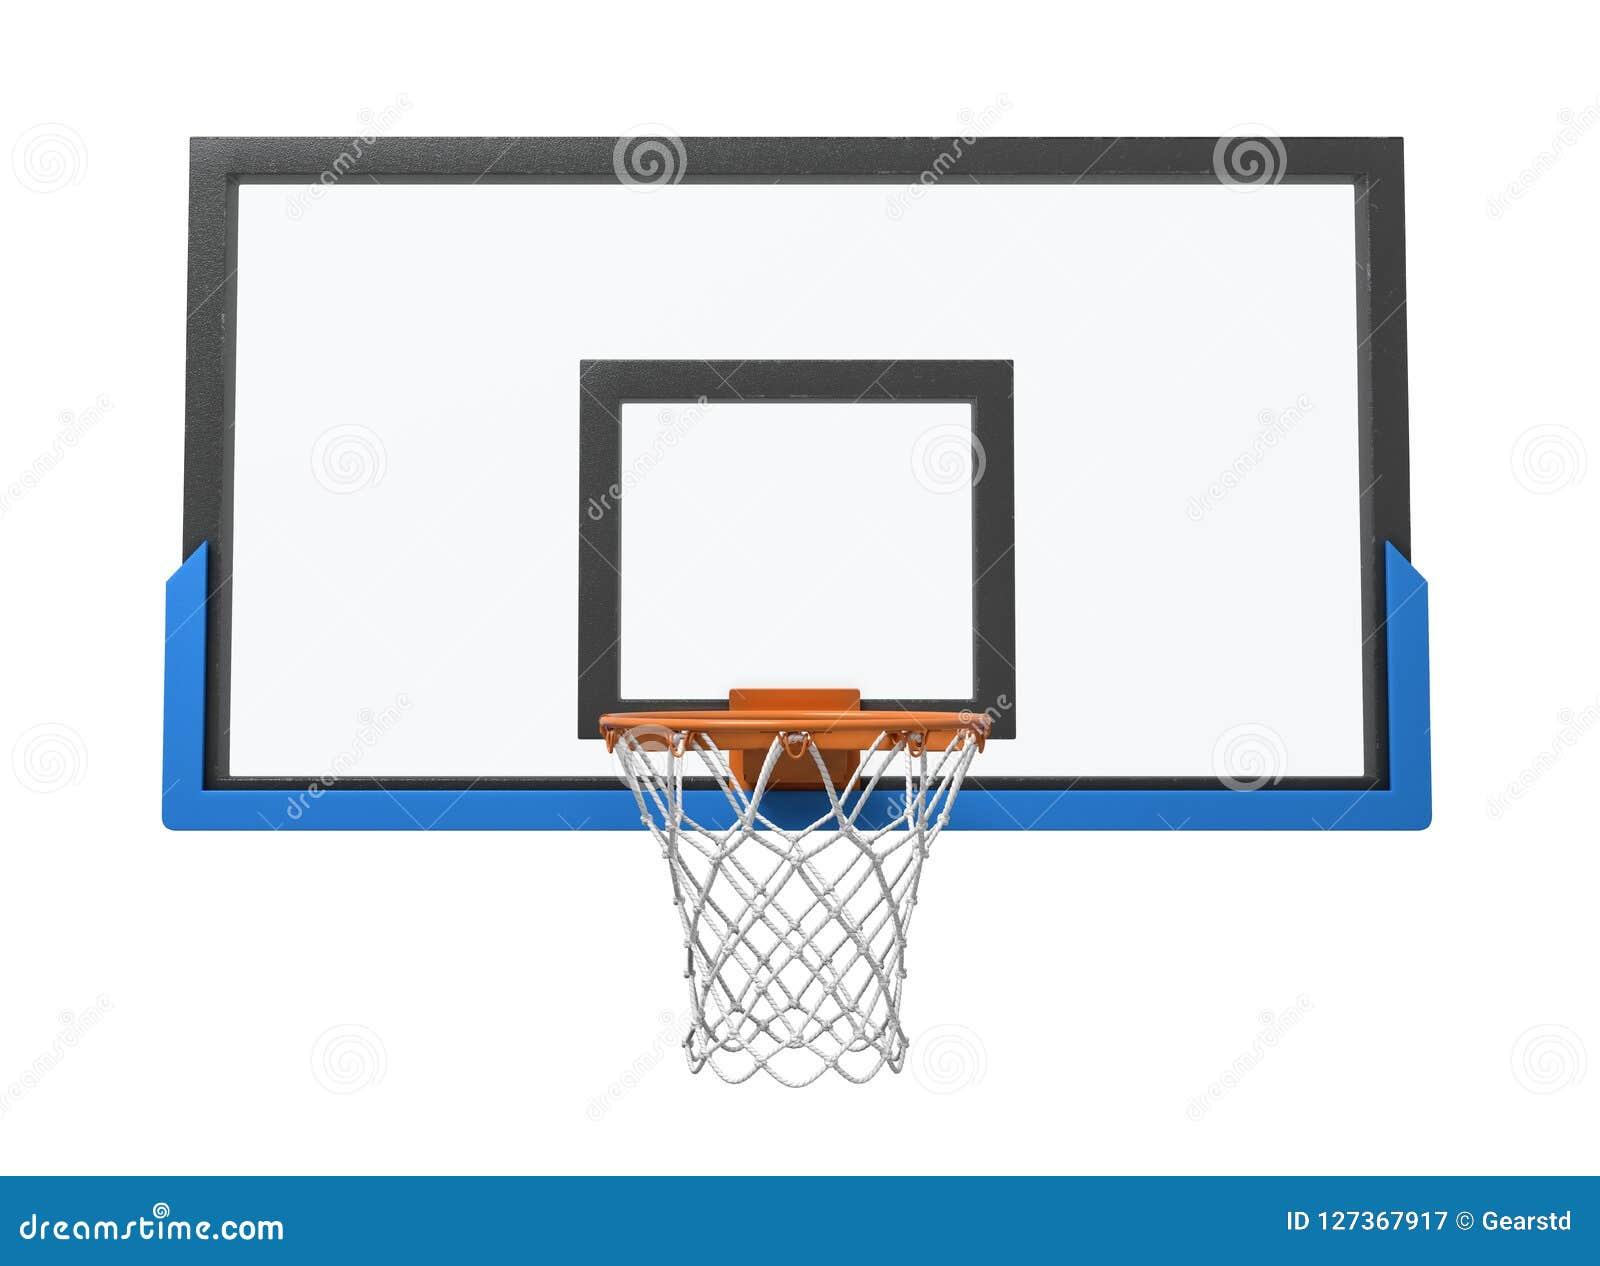 3d一个篮球篮的翻译与一张空的篮子和透明蓝球板的